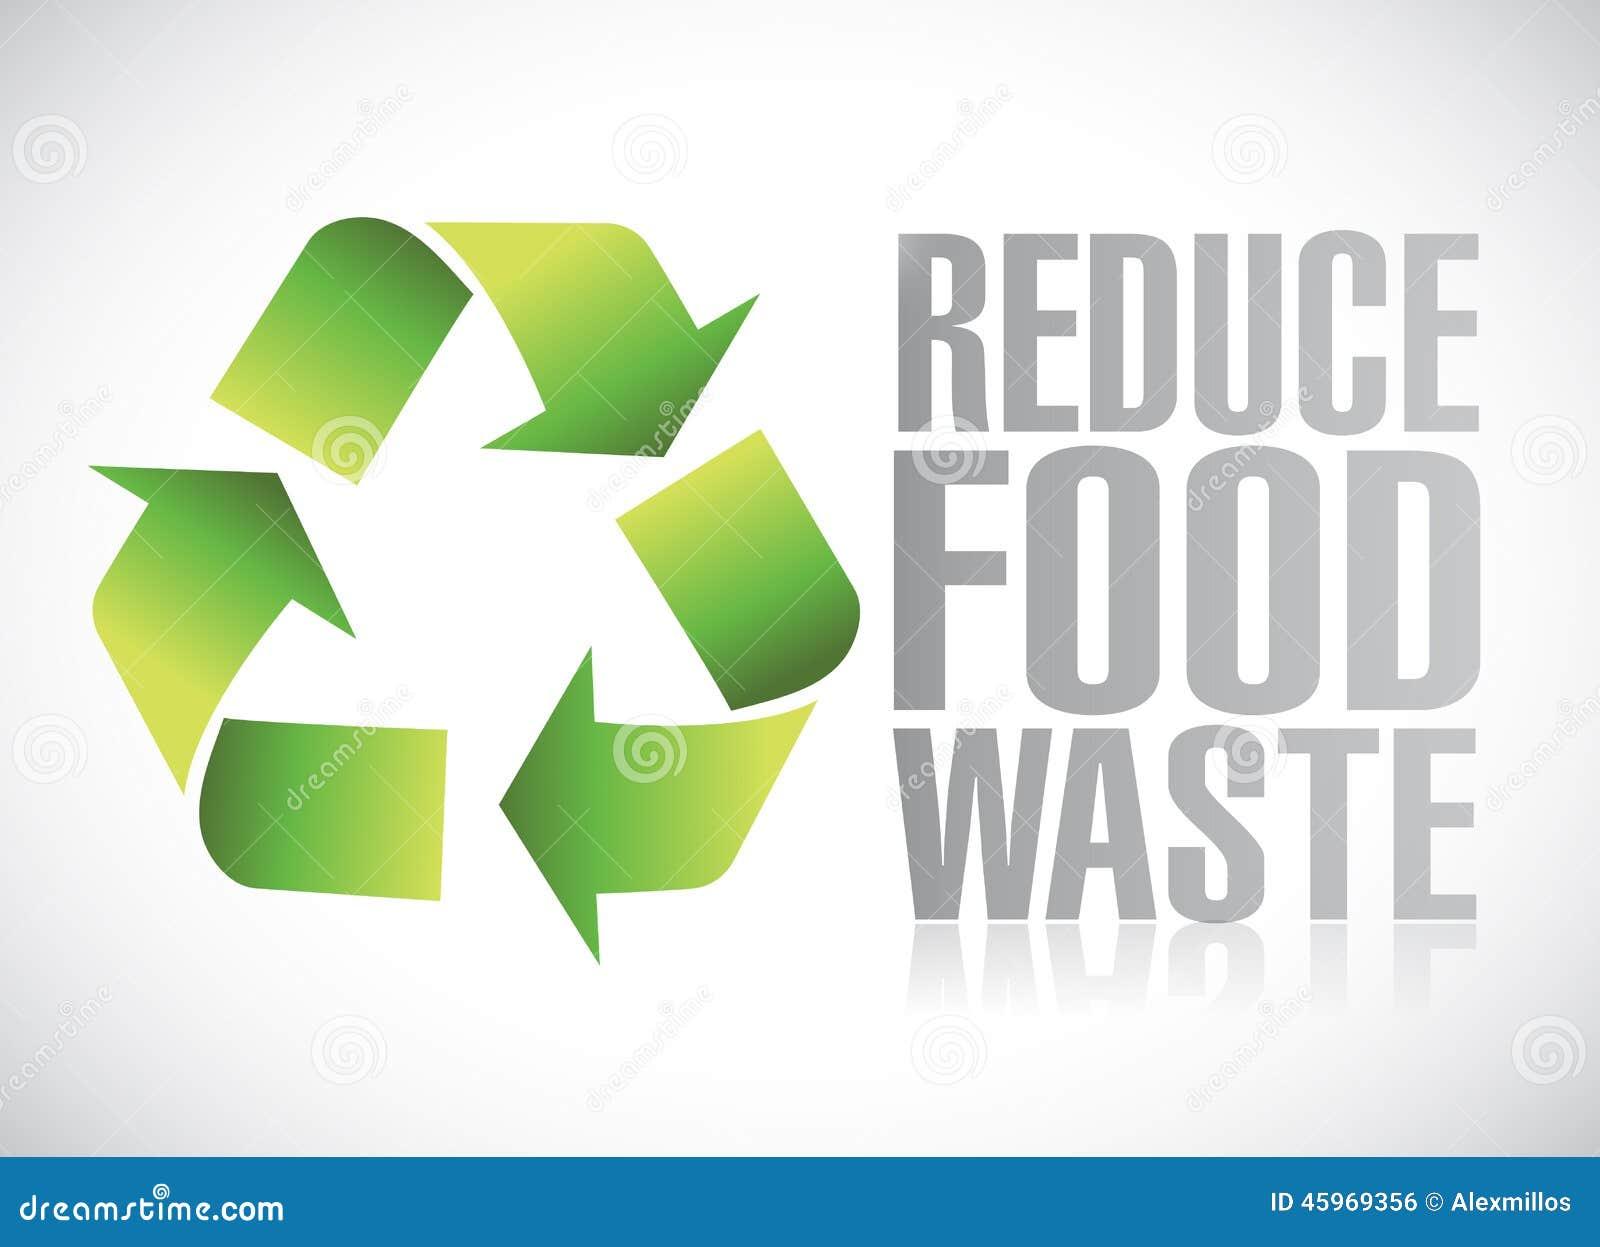 Reduce Food Waste Sign Illustration Stock Illustration ...